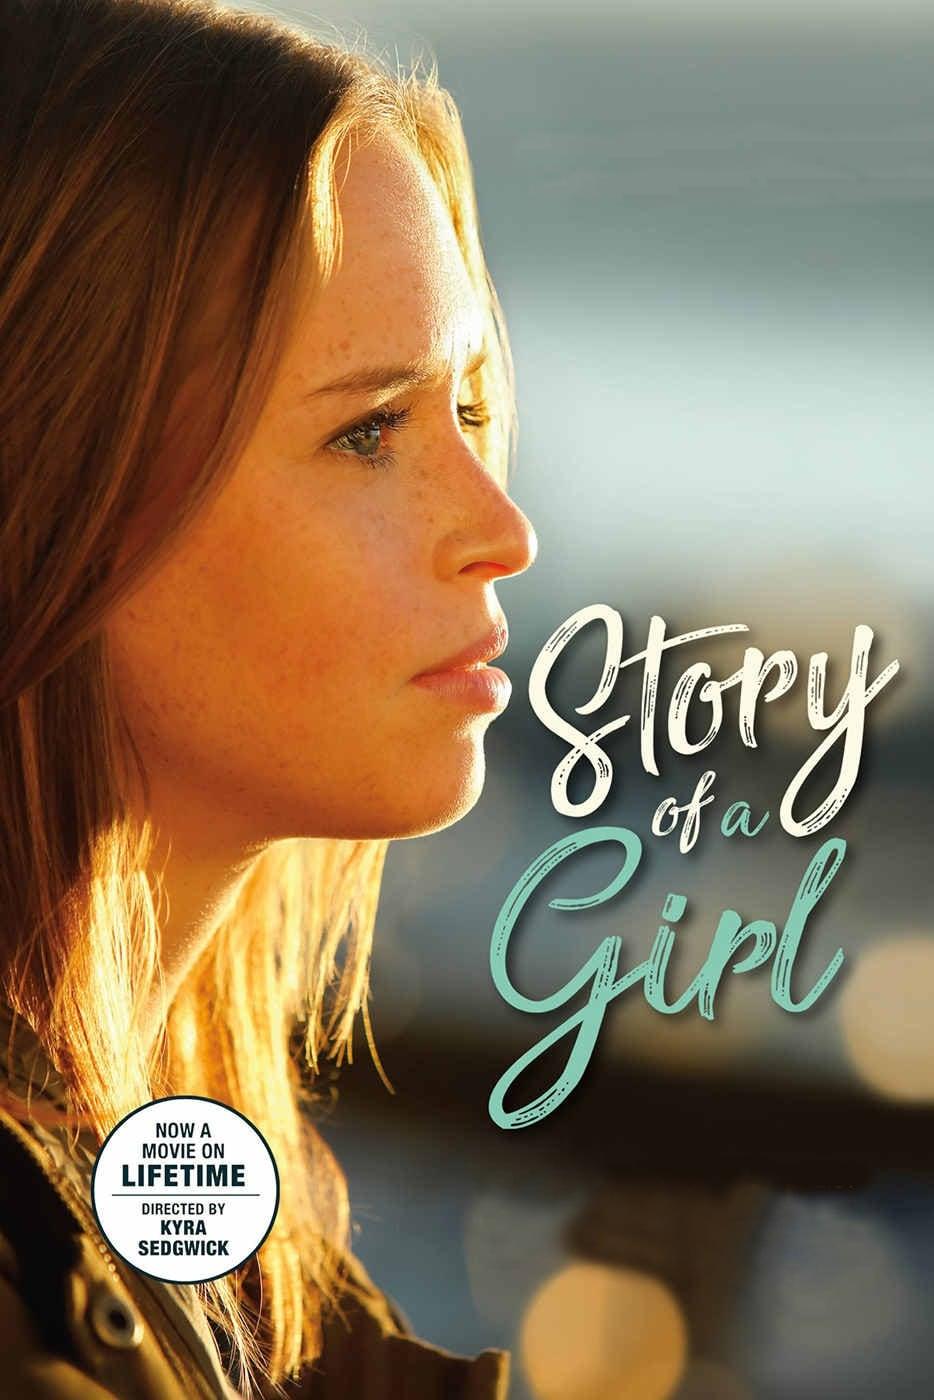 Free girl on girl movies